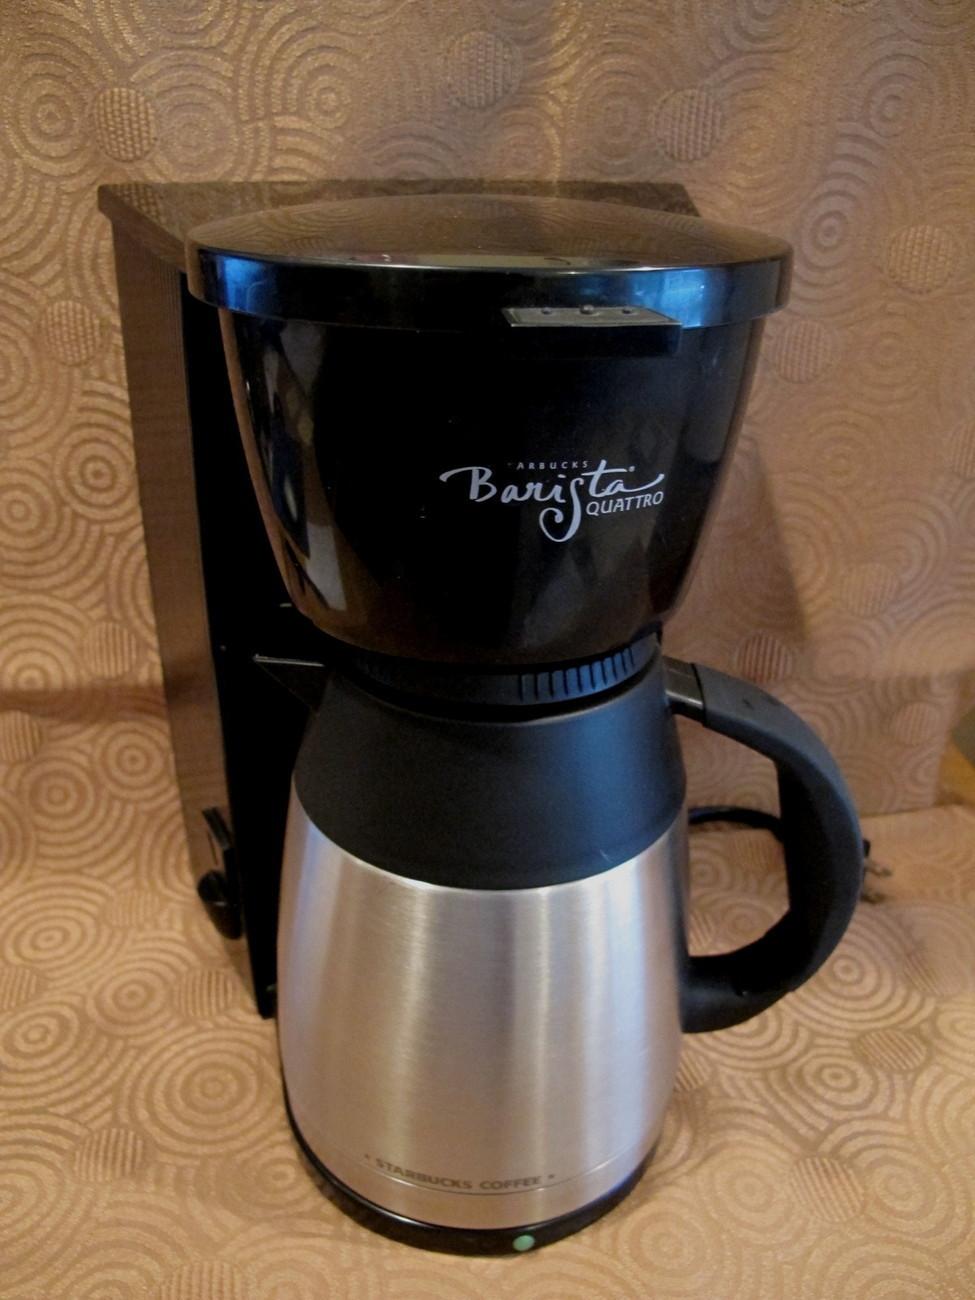 Starbucks Stainless Coffee Maker Machine 3 Cup Mug Barista Quattro Pot